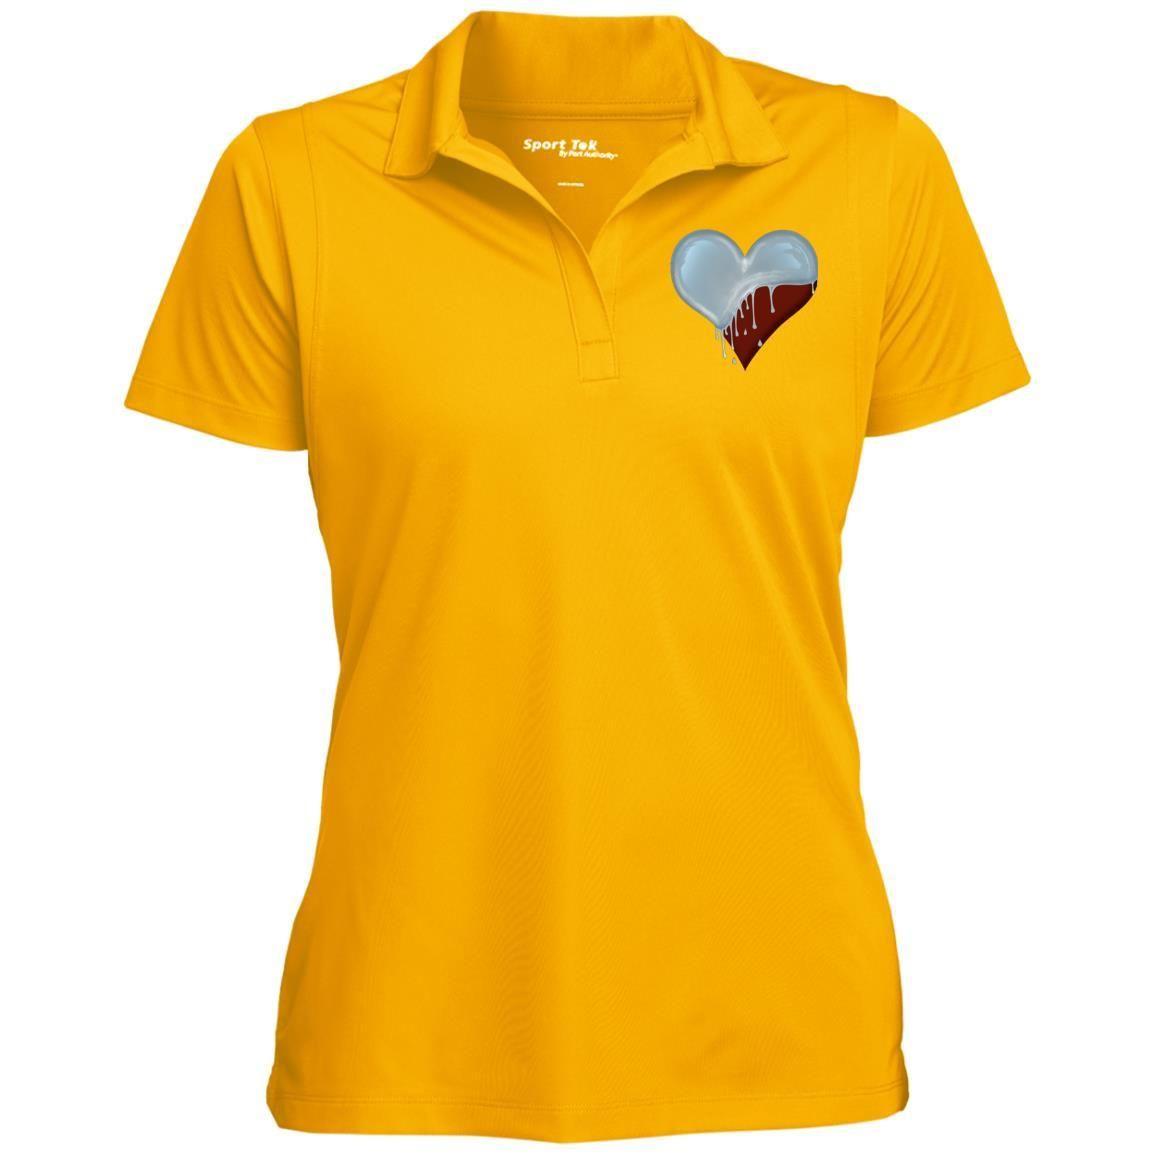 Dripping Heart LST650 Sport-Tek Women's Micropique Tag-Free Flat-Knit Collar Polo